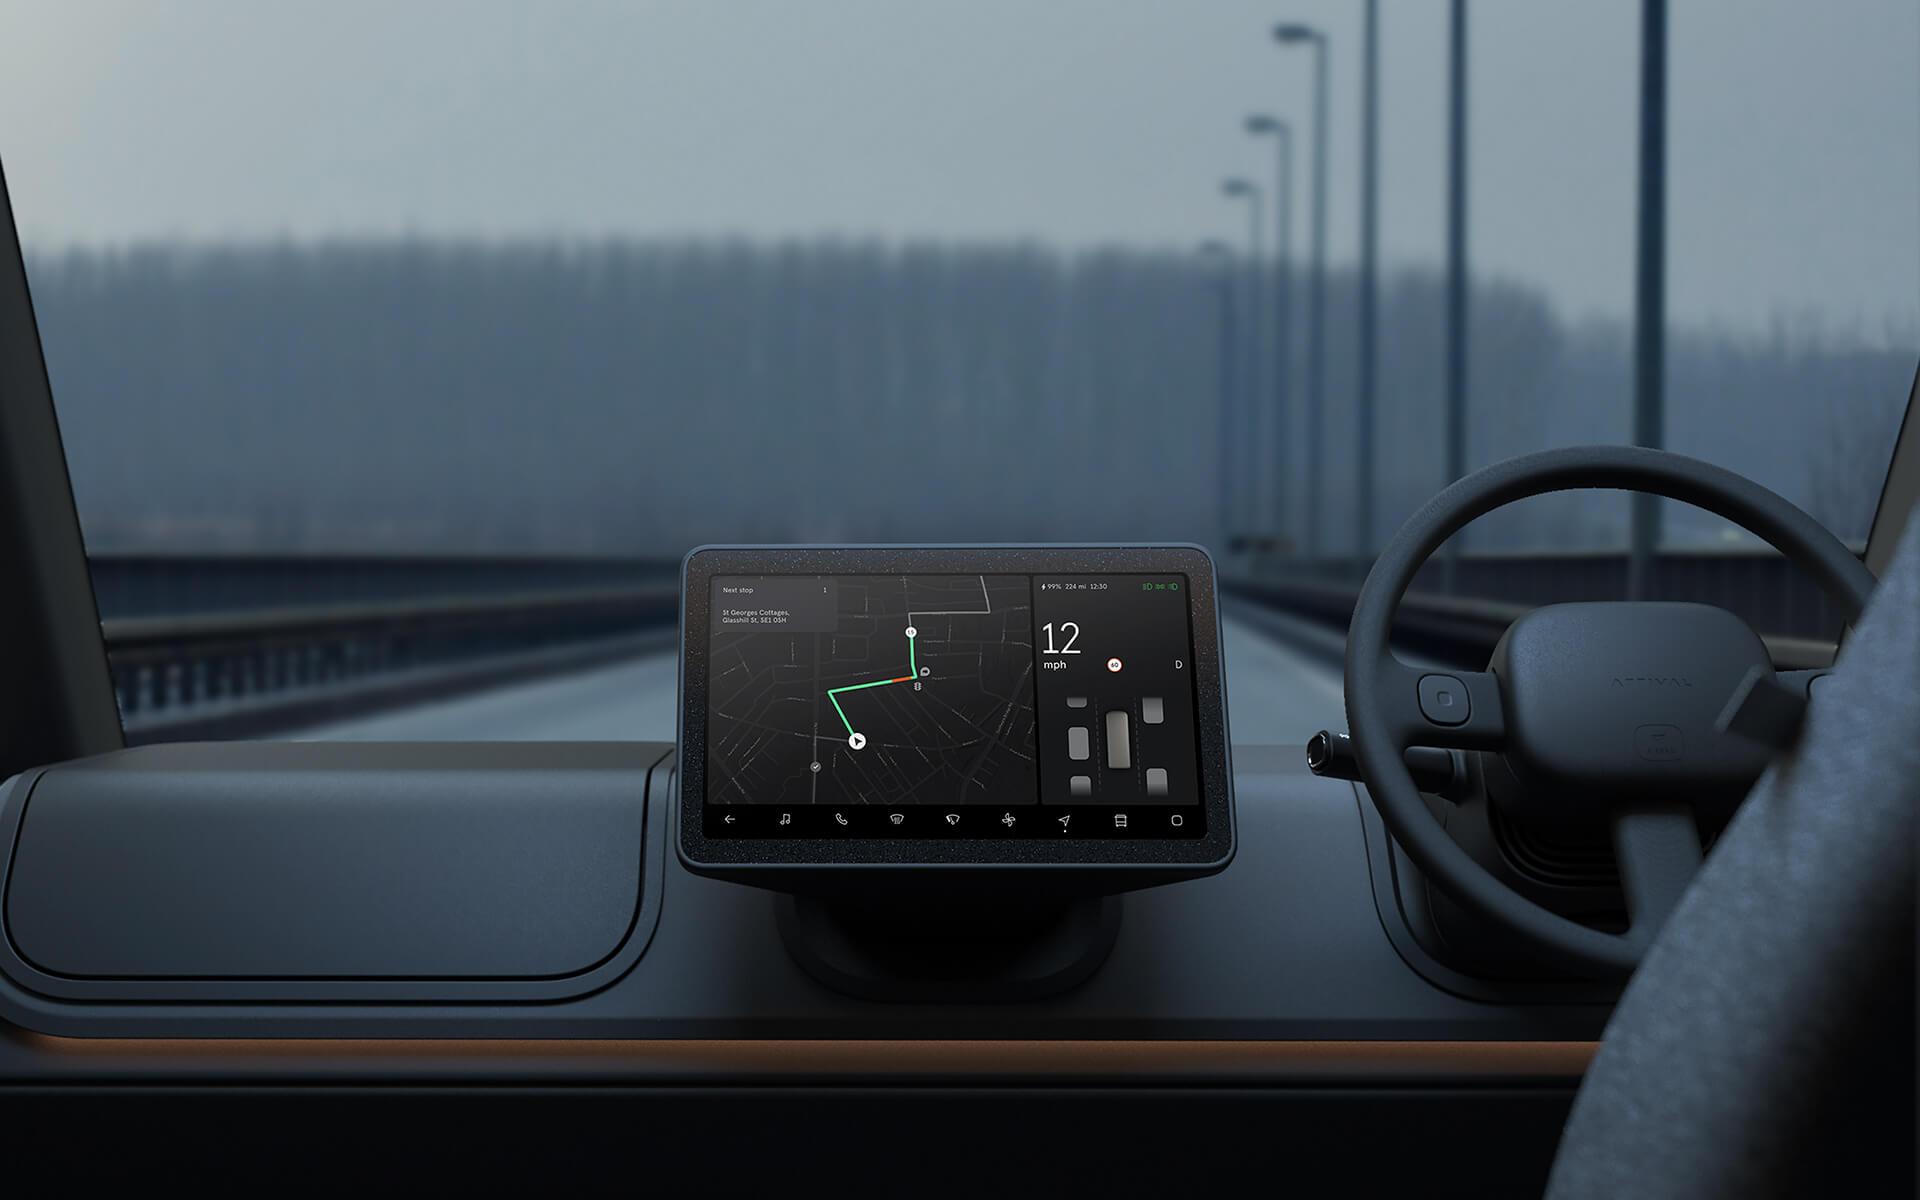 HMI Touchscreen Next to Driver Controls in Van Cabin